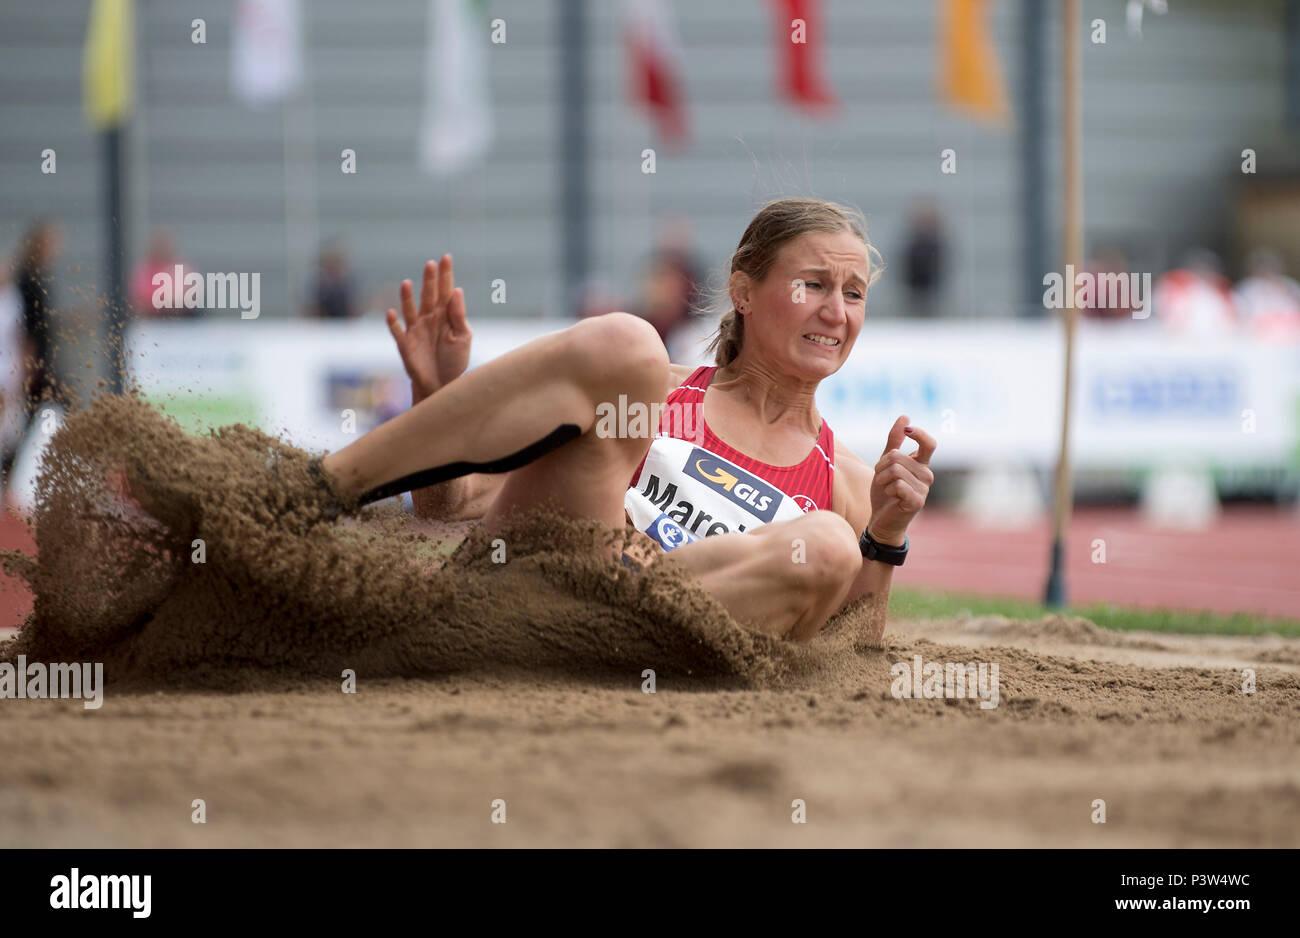 Mareike ARNDT (GER/TSV Bayer 04 Leverkusen) Action, landing. Women's long jump, on 17.06.2018 Athletics Stadtwerke Ratingen All-around meeting, from 16.06. -17.06.2018 in Ratingen/Germany. | usage worldwide - Stock Image